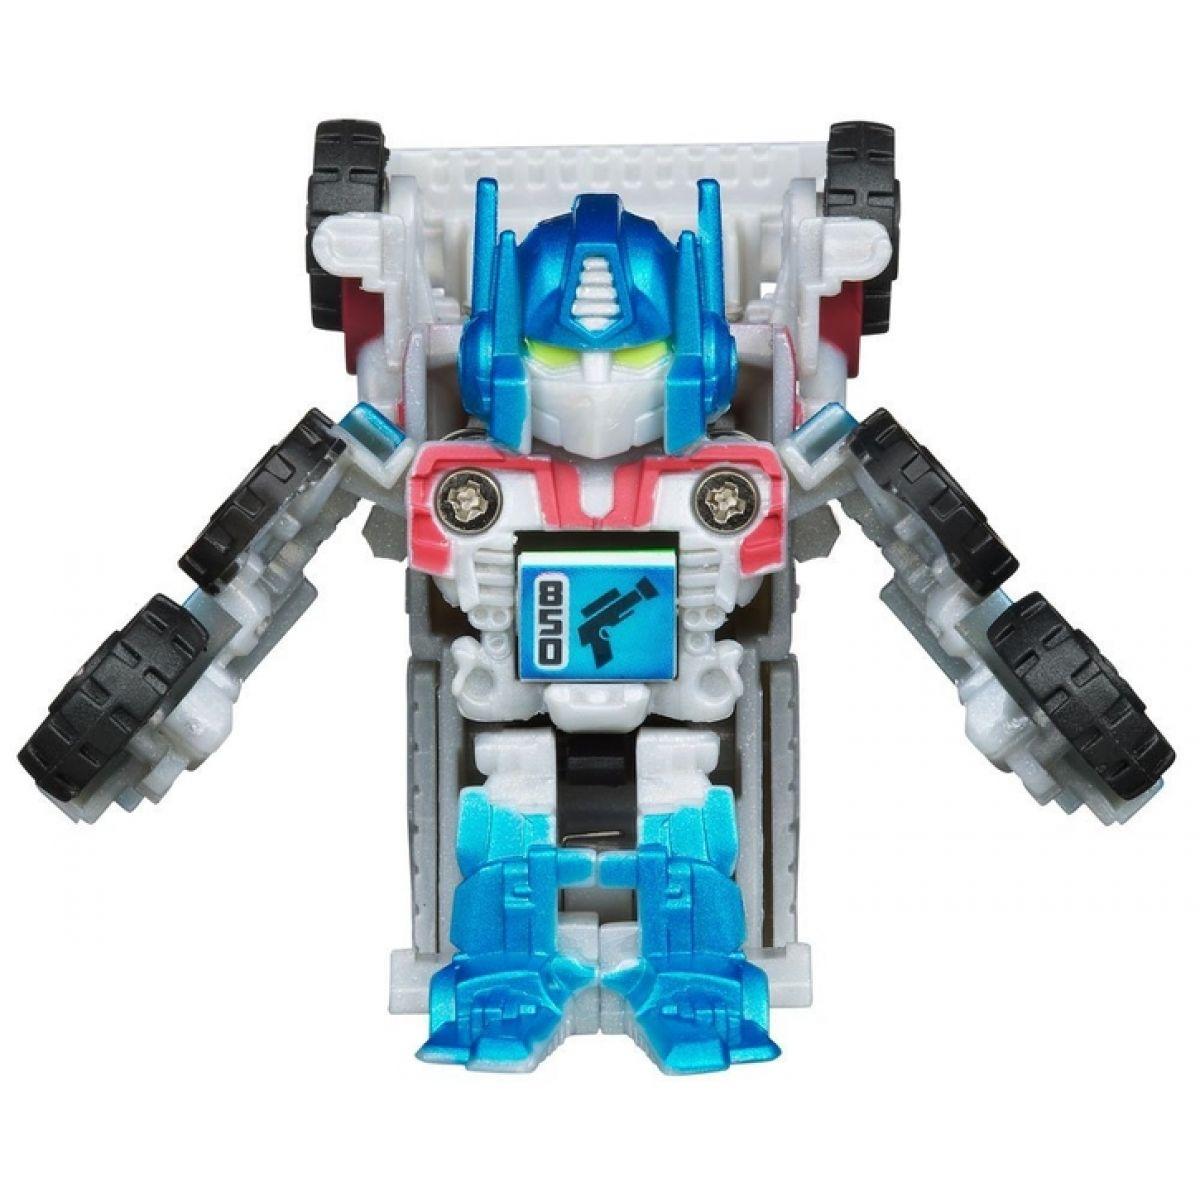 Transformers BOT SHOTS Hasbro - B003 Optimus Prime